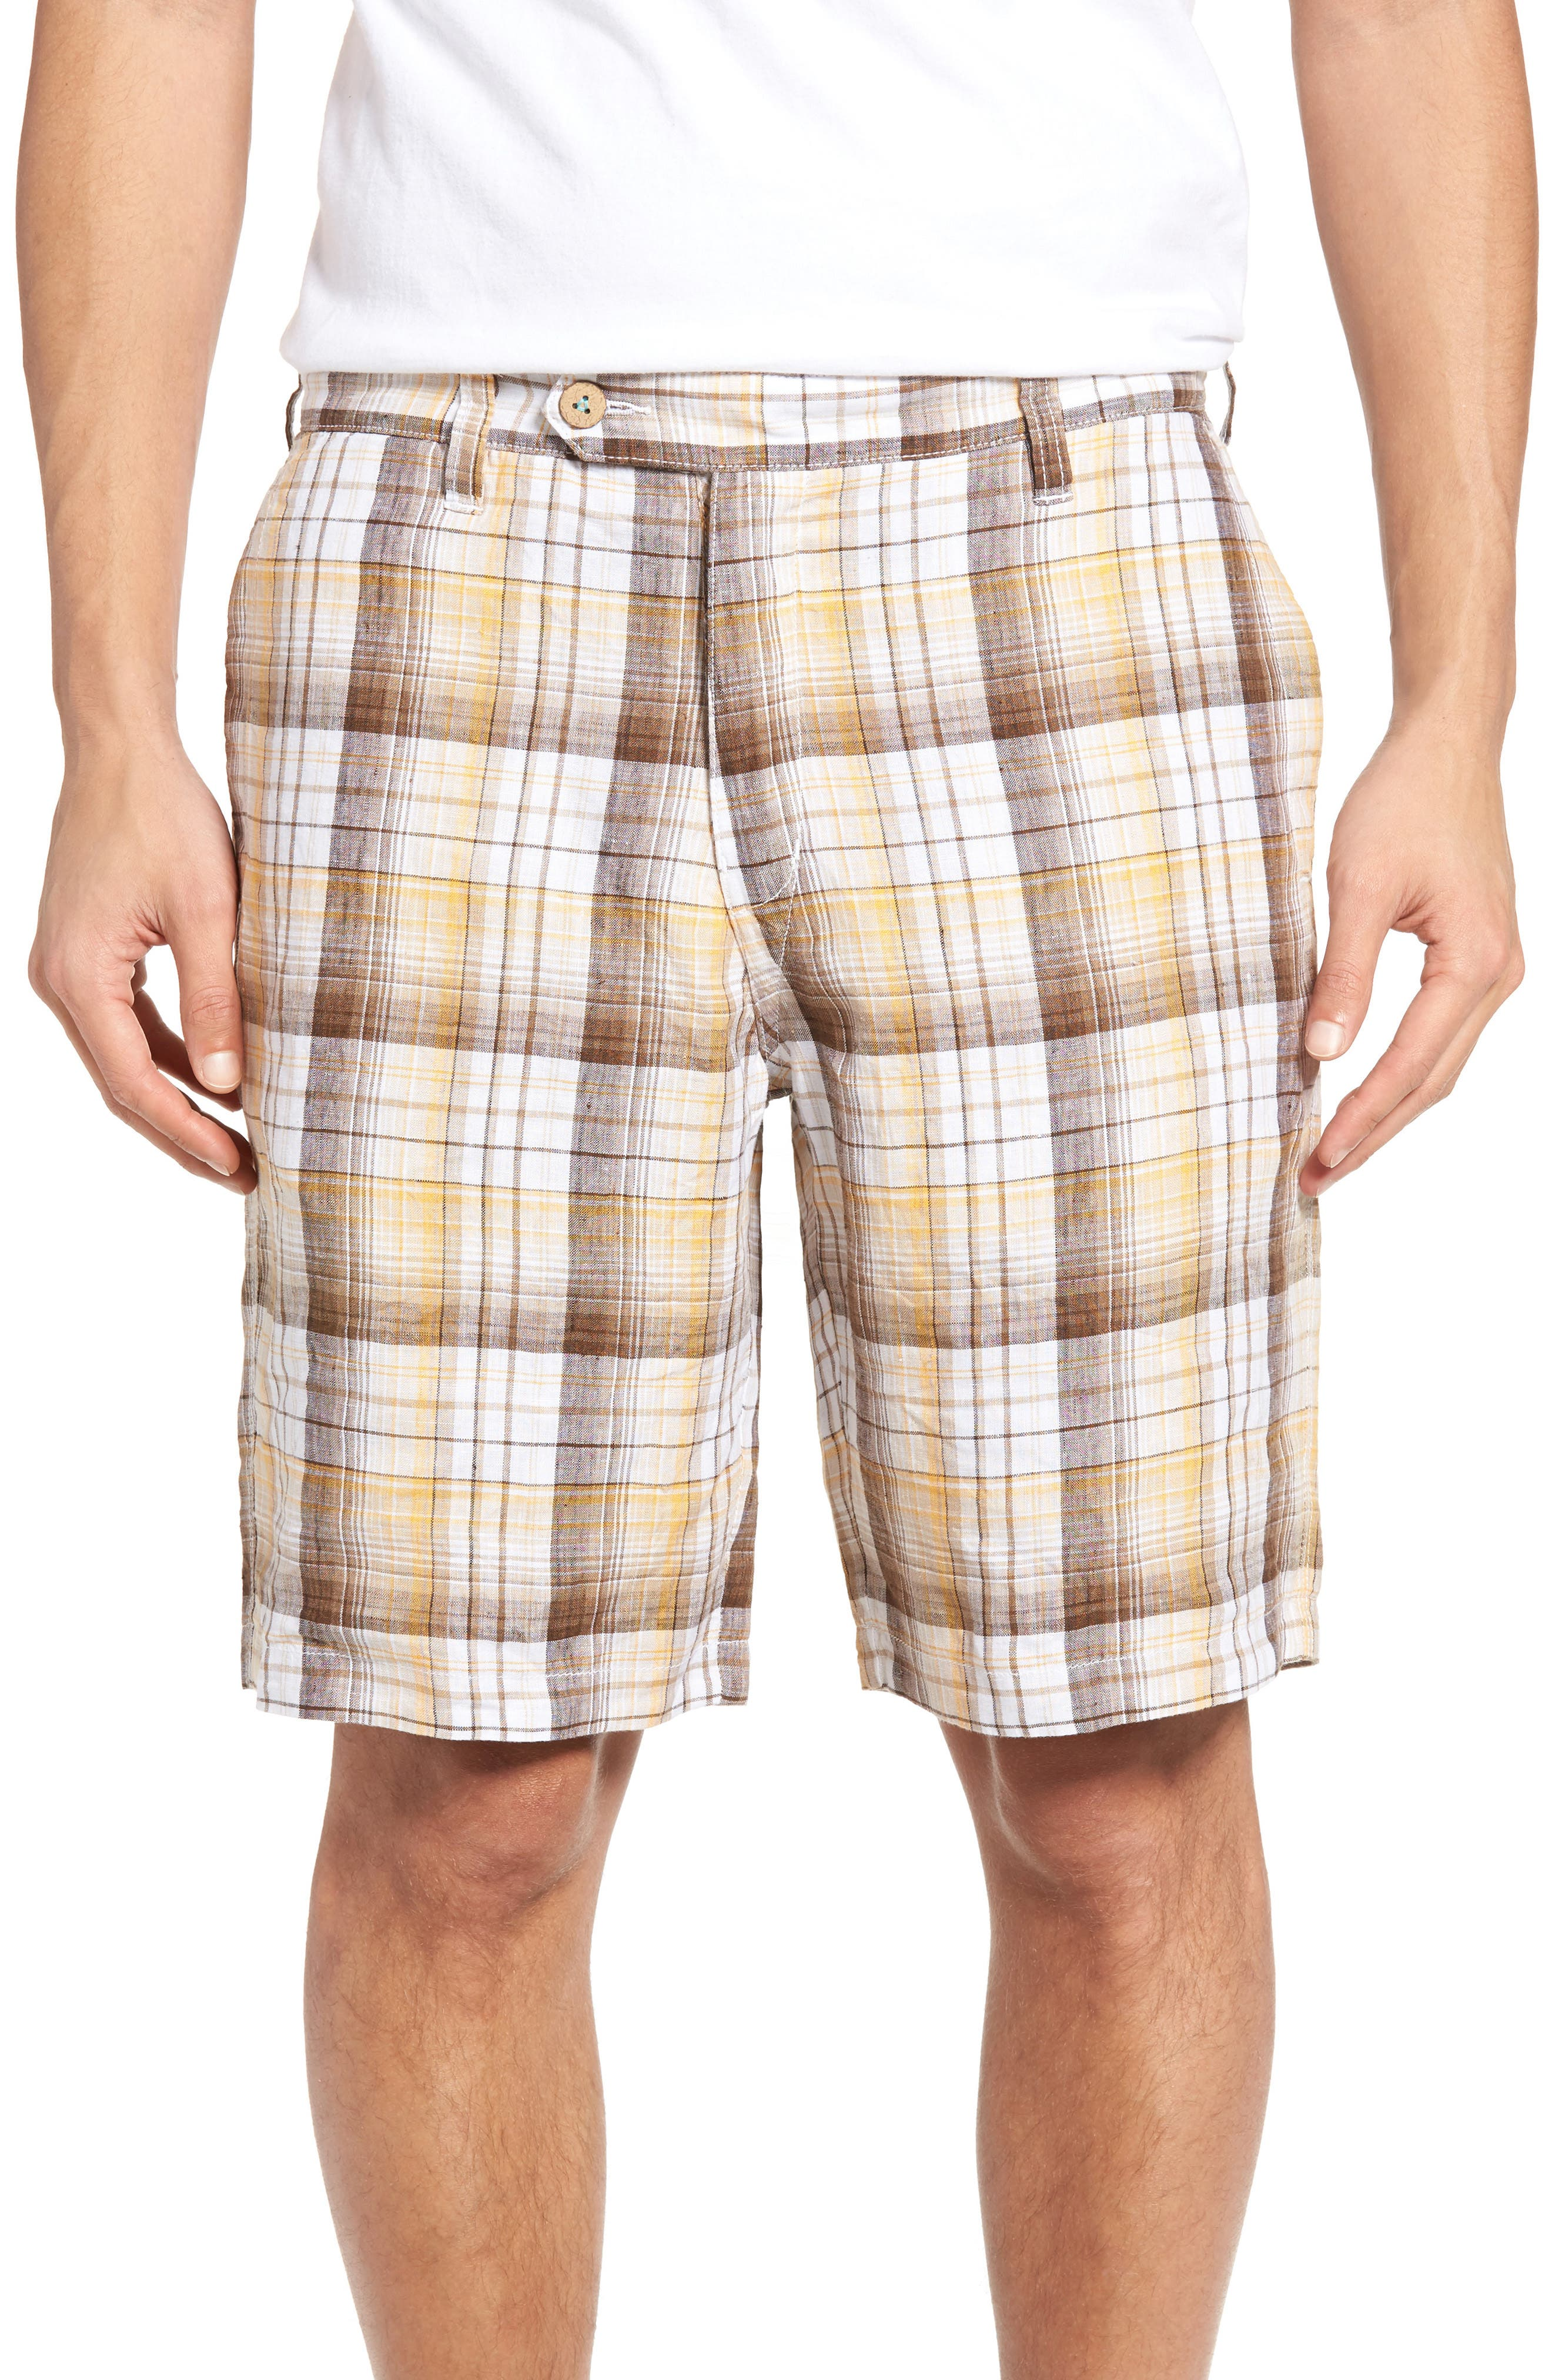 Tommy Bahama Island Duo Reversible Linen Shorts (Big & Tall)